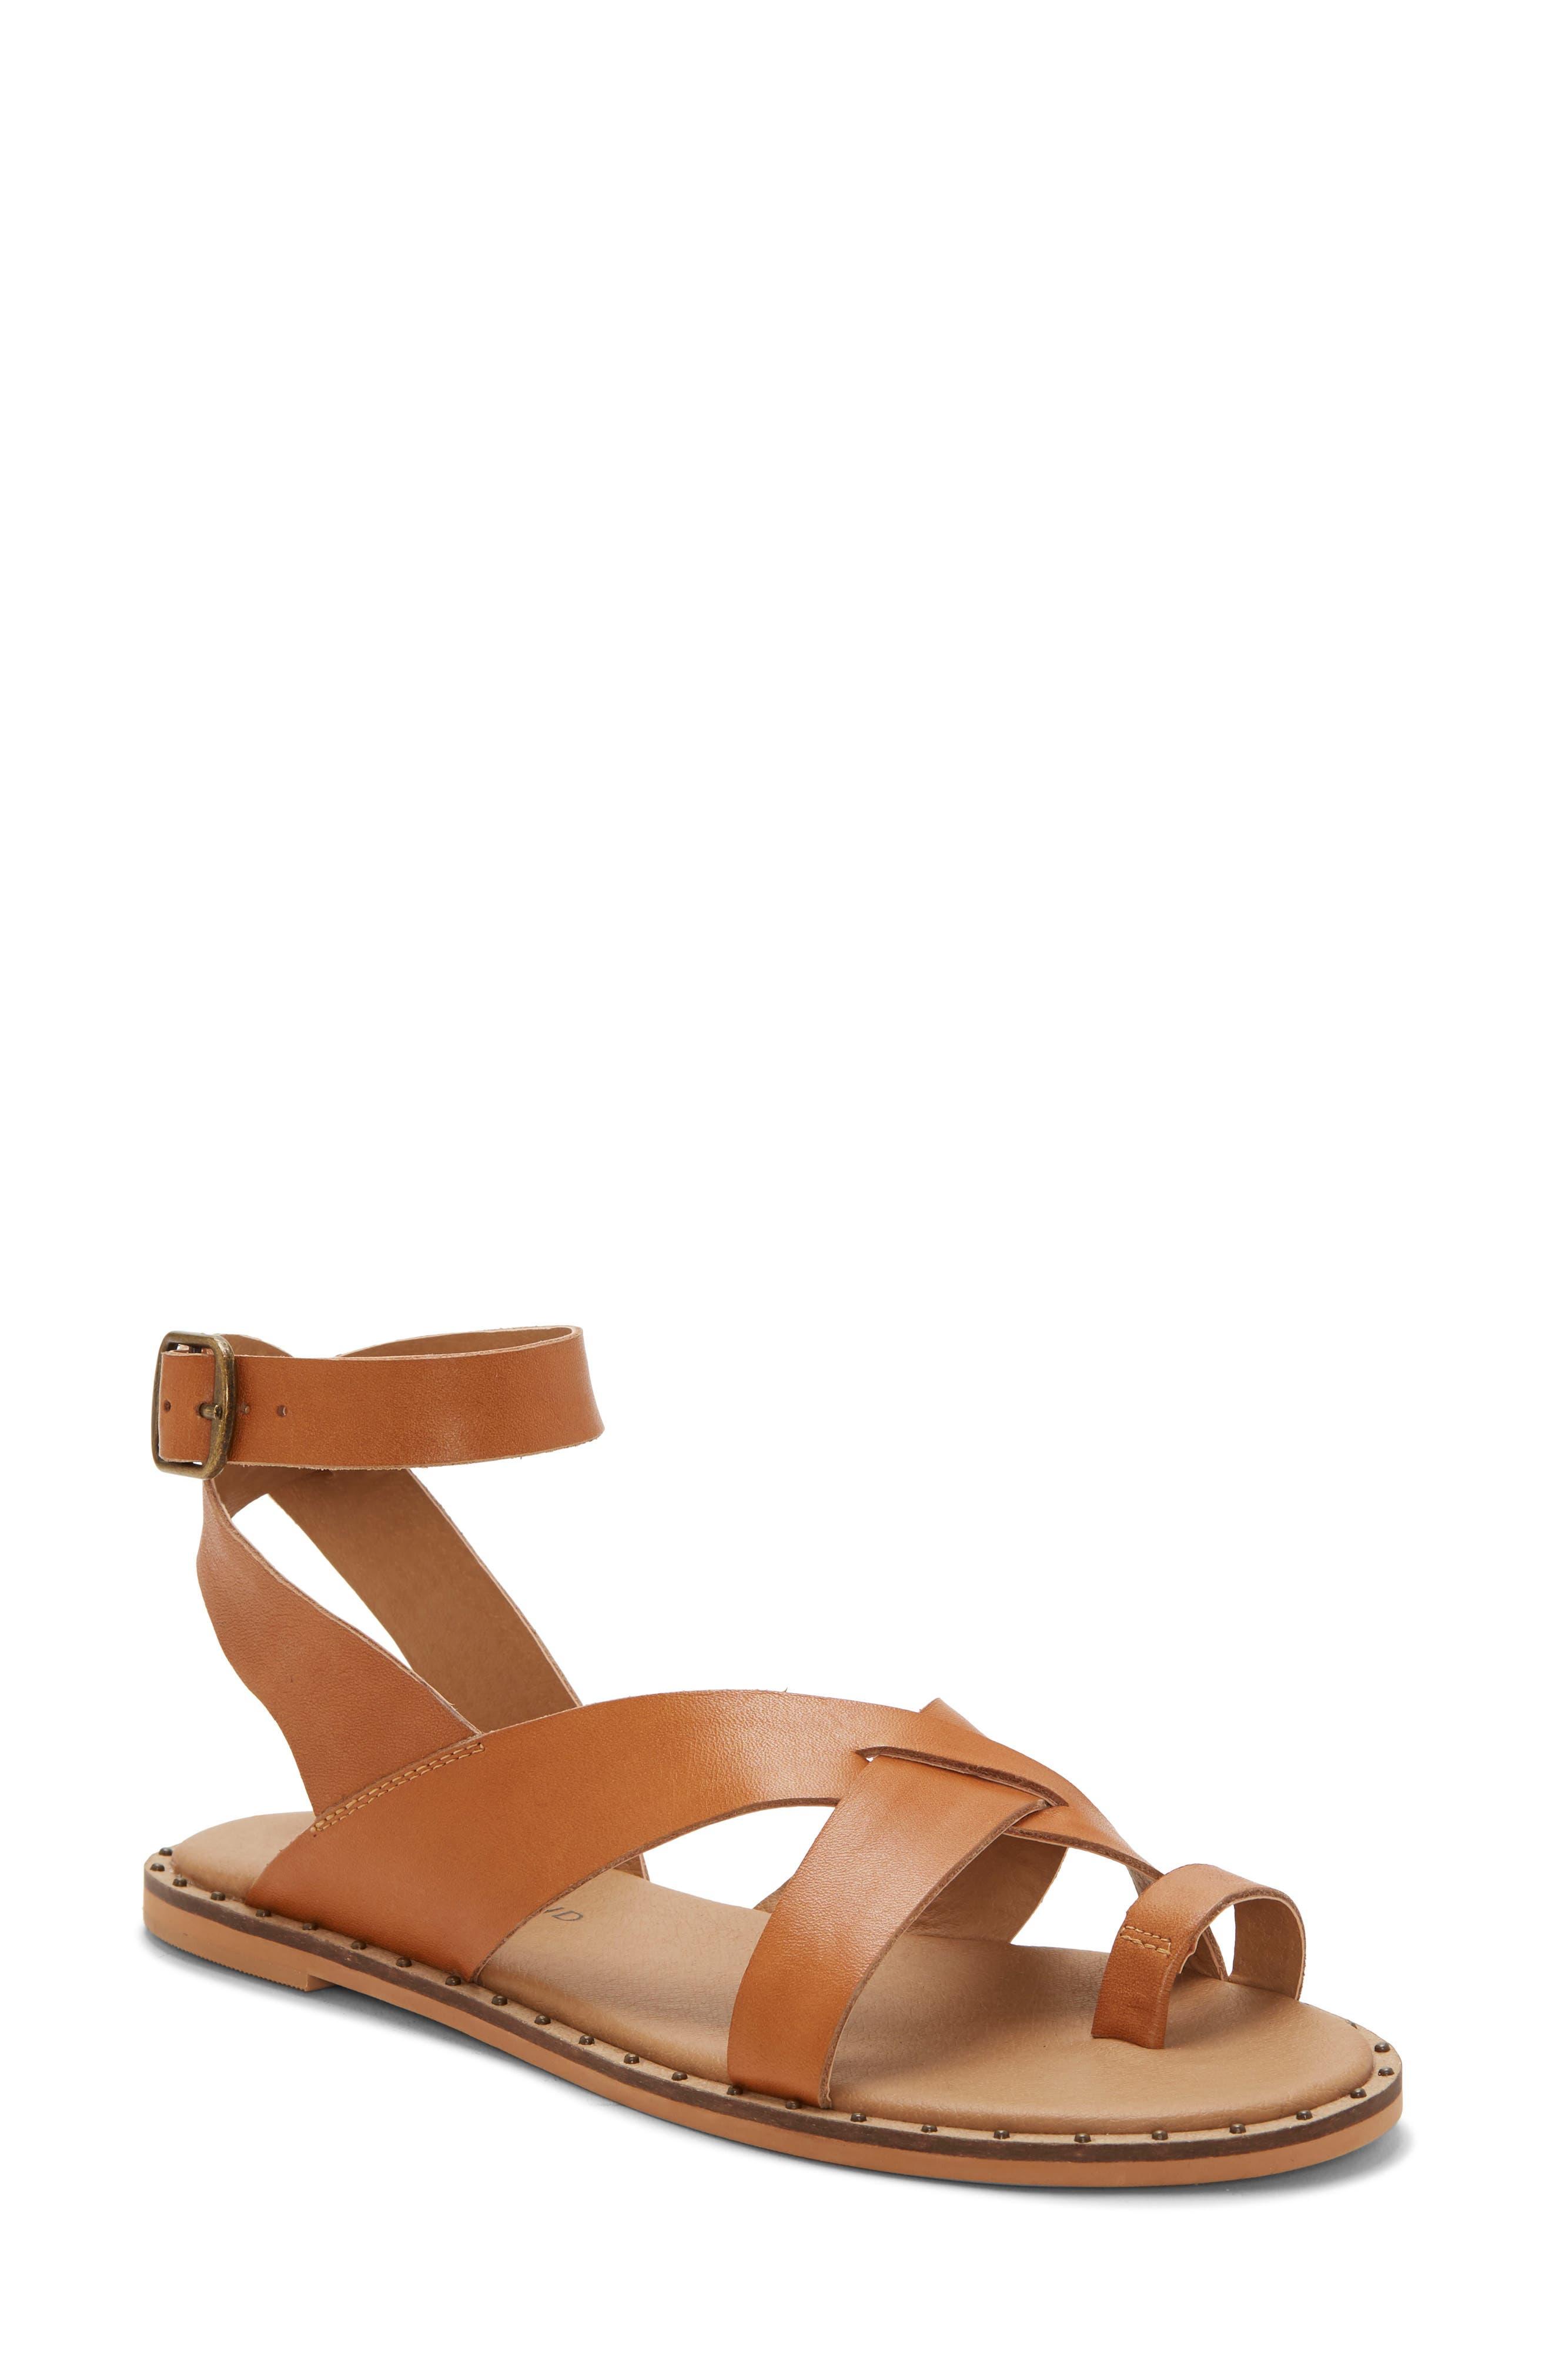 Lucky Brand Farran Toe Loop Sandal- Brown